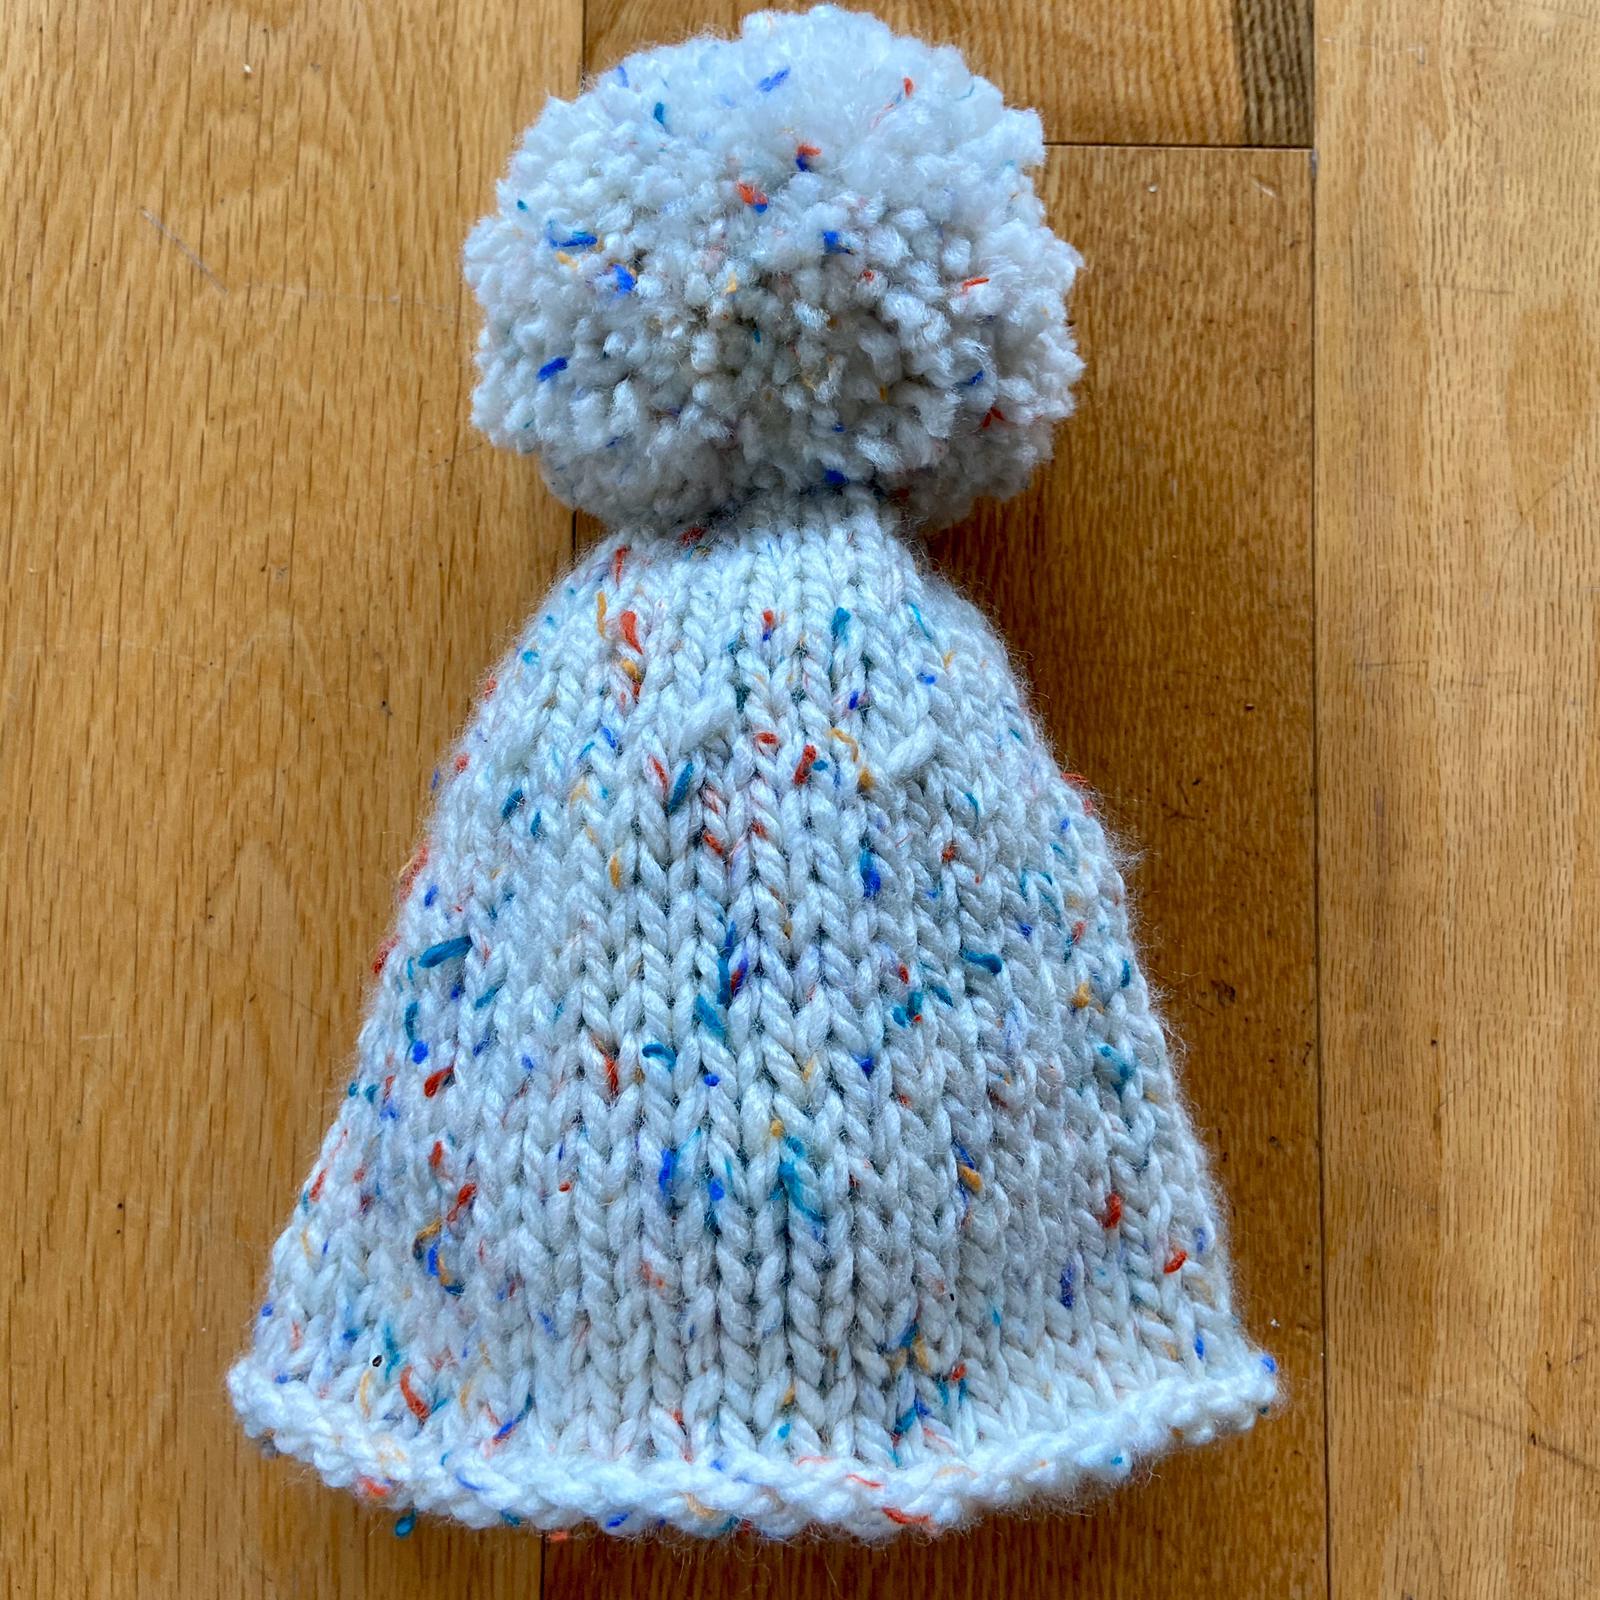 Easy Bobble Hat Knitting Pattern - Sleek For Yourself!